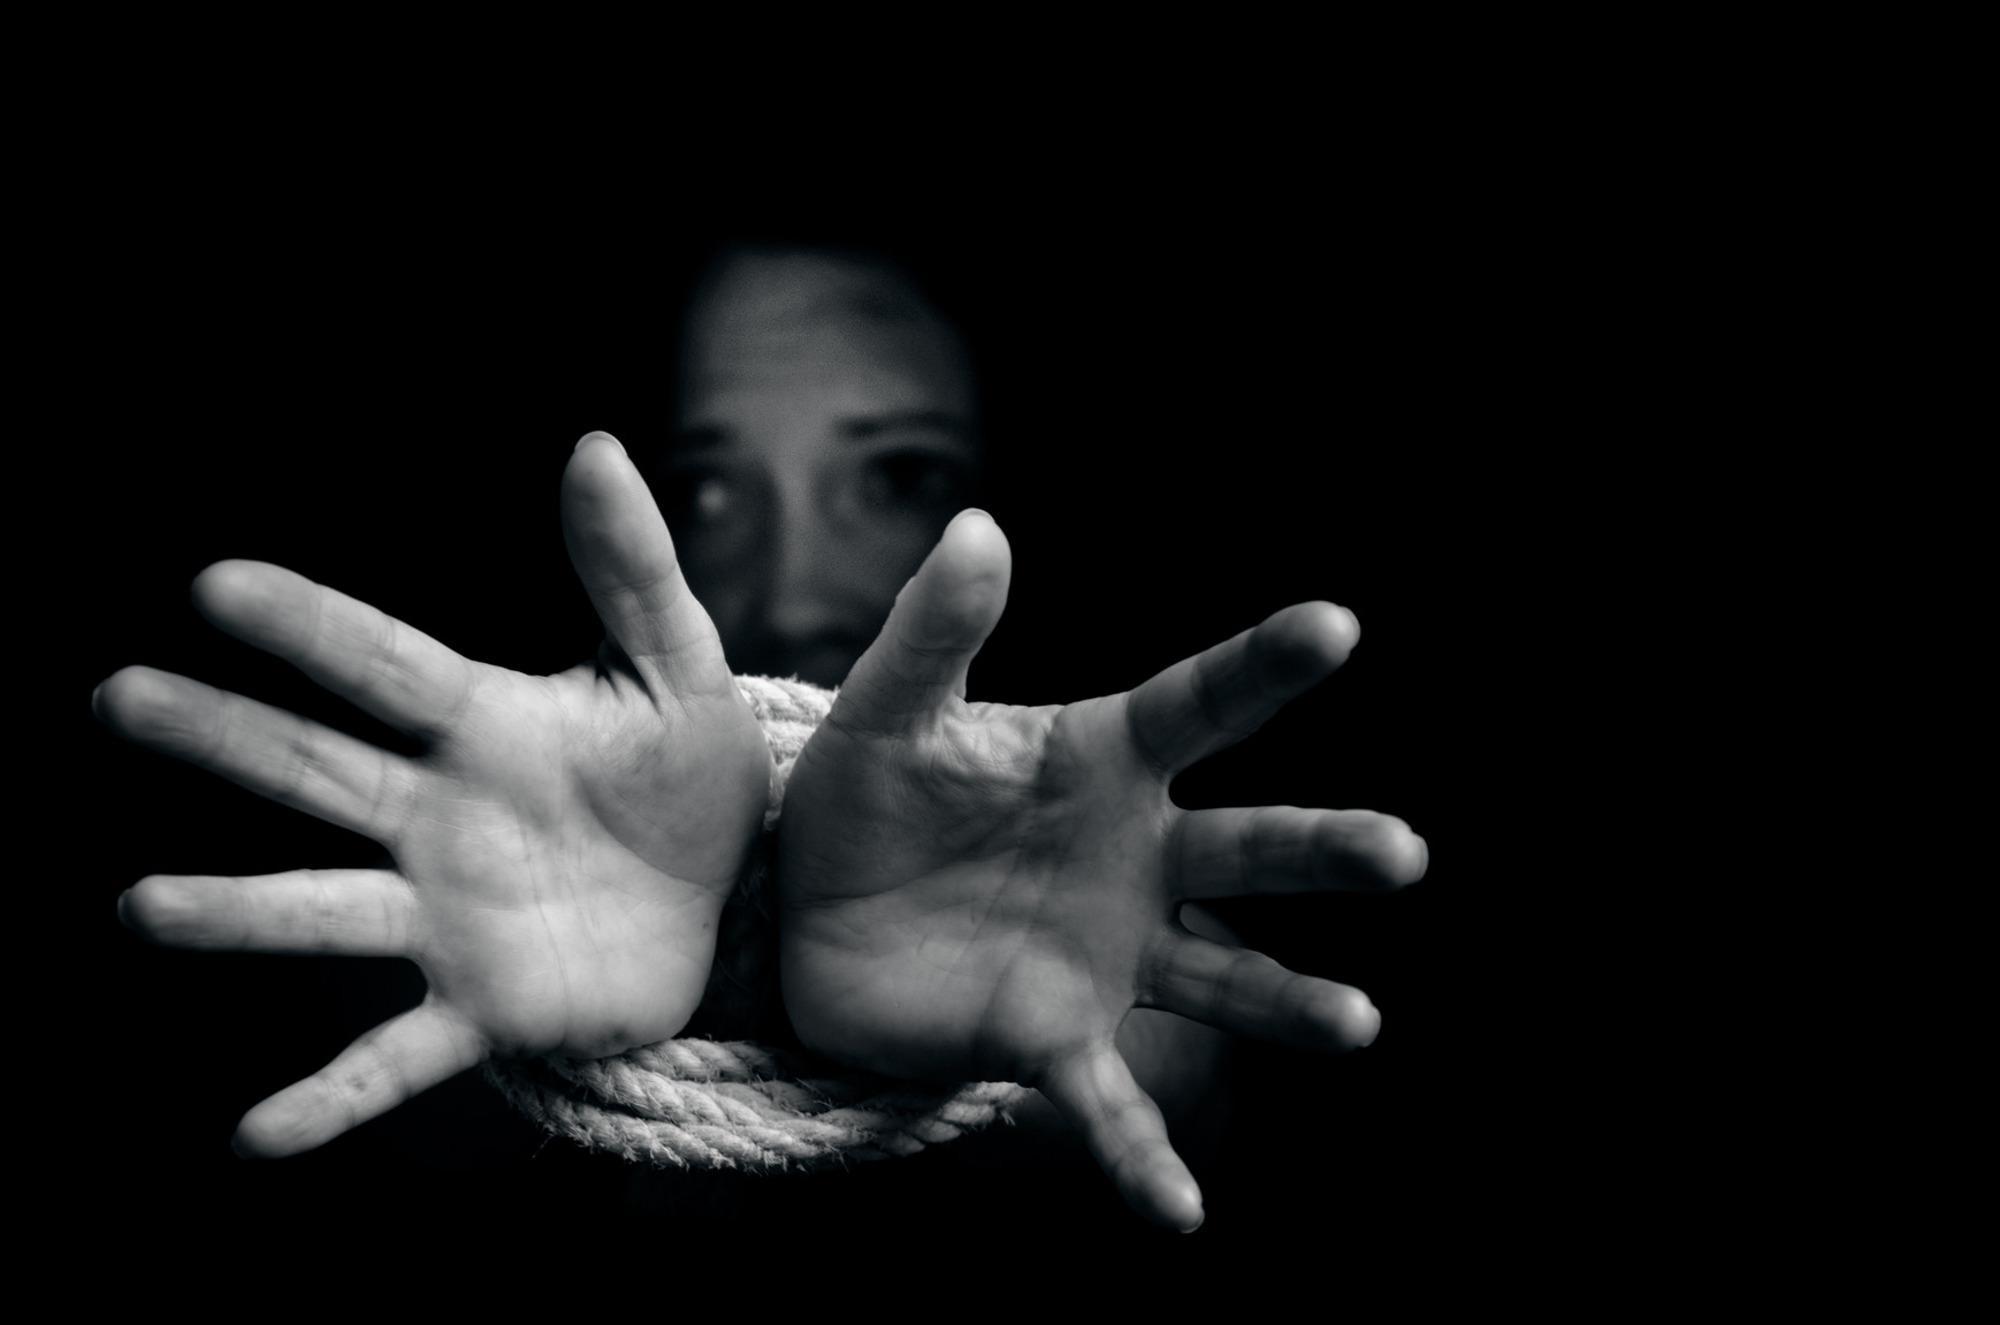 Trafficking: Το 73% των θυμάτων στην Ελλάδα είναι γυναίκες και ανήλικα